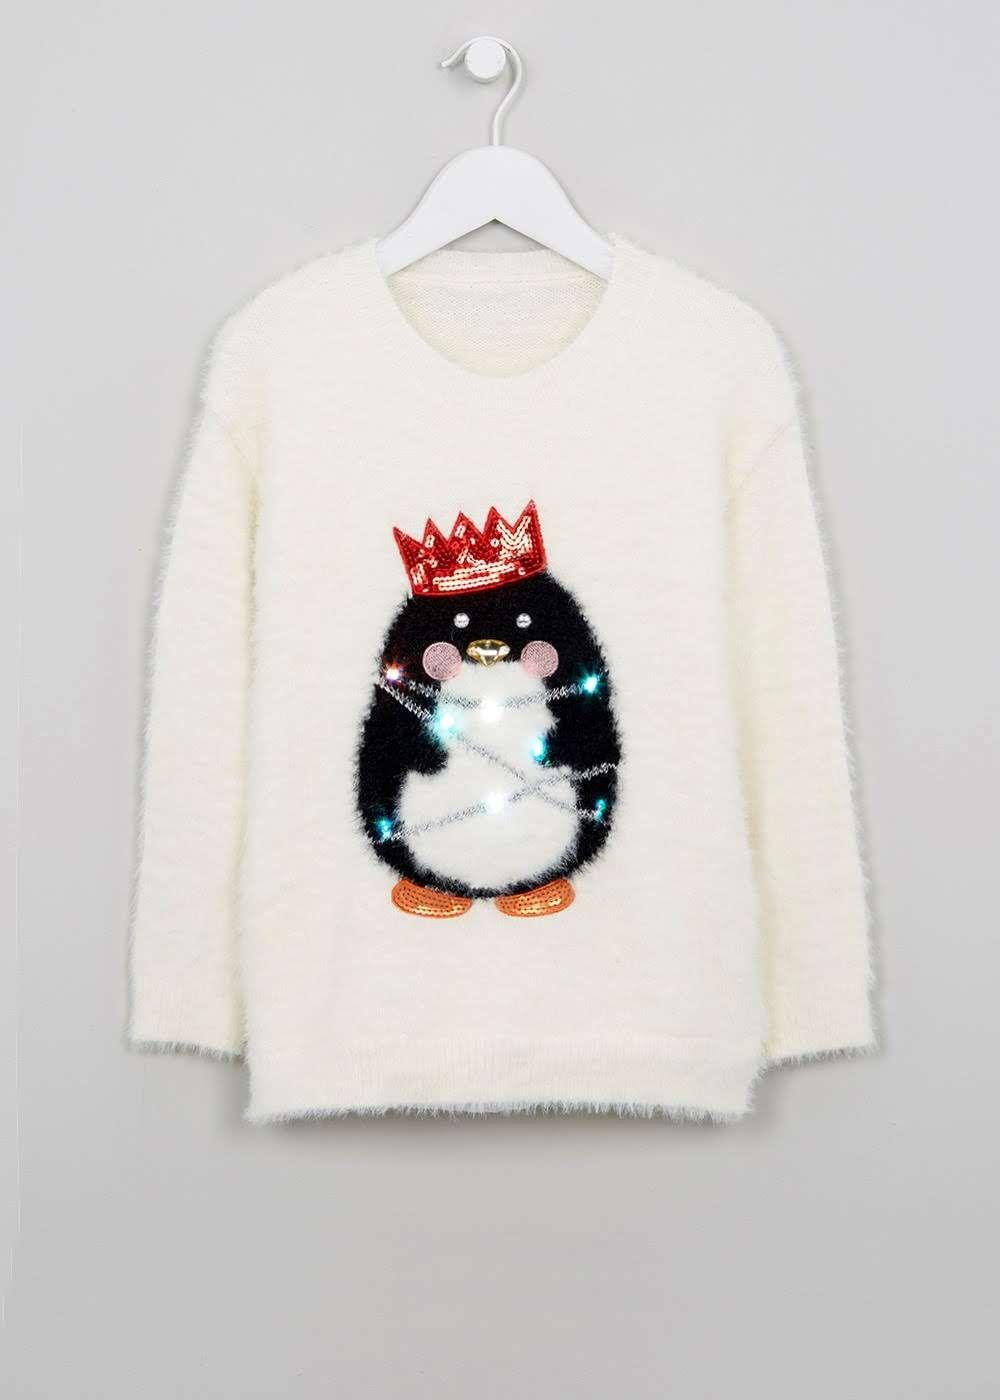 Girls Christmas Light Up Penguin Jumper (3-13yrs) View 1   Christmas ...